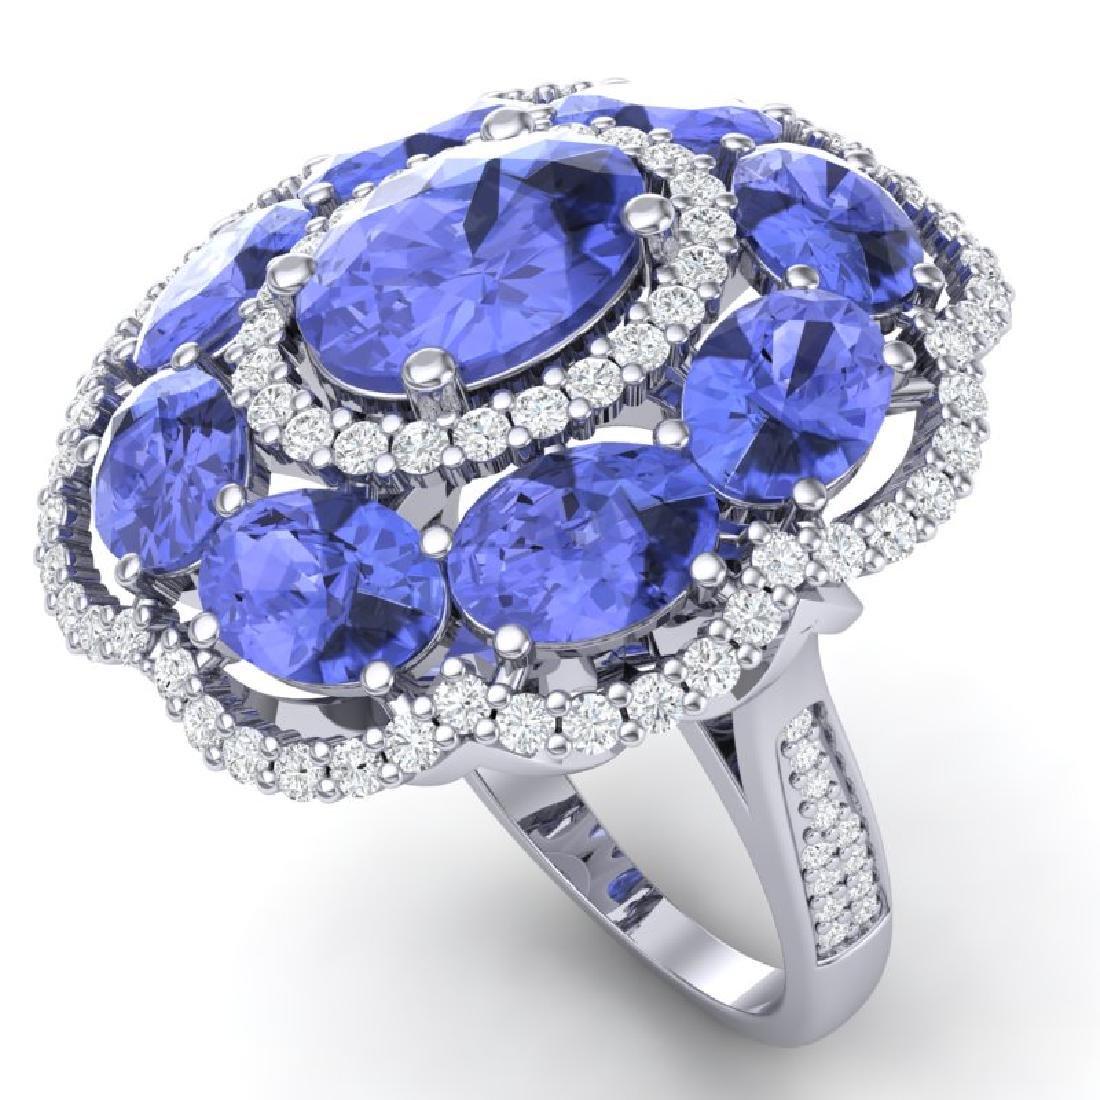 15.24 CTW Royalty Tanzanite & VS Diamond Ring 18K White